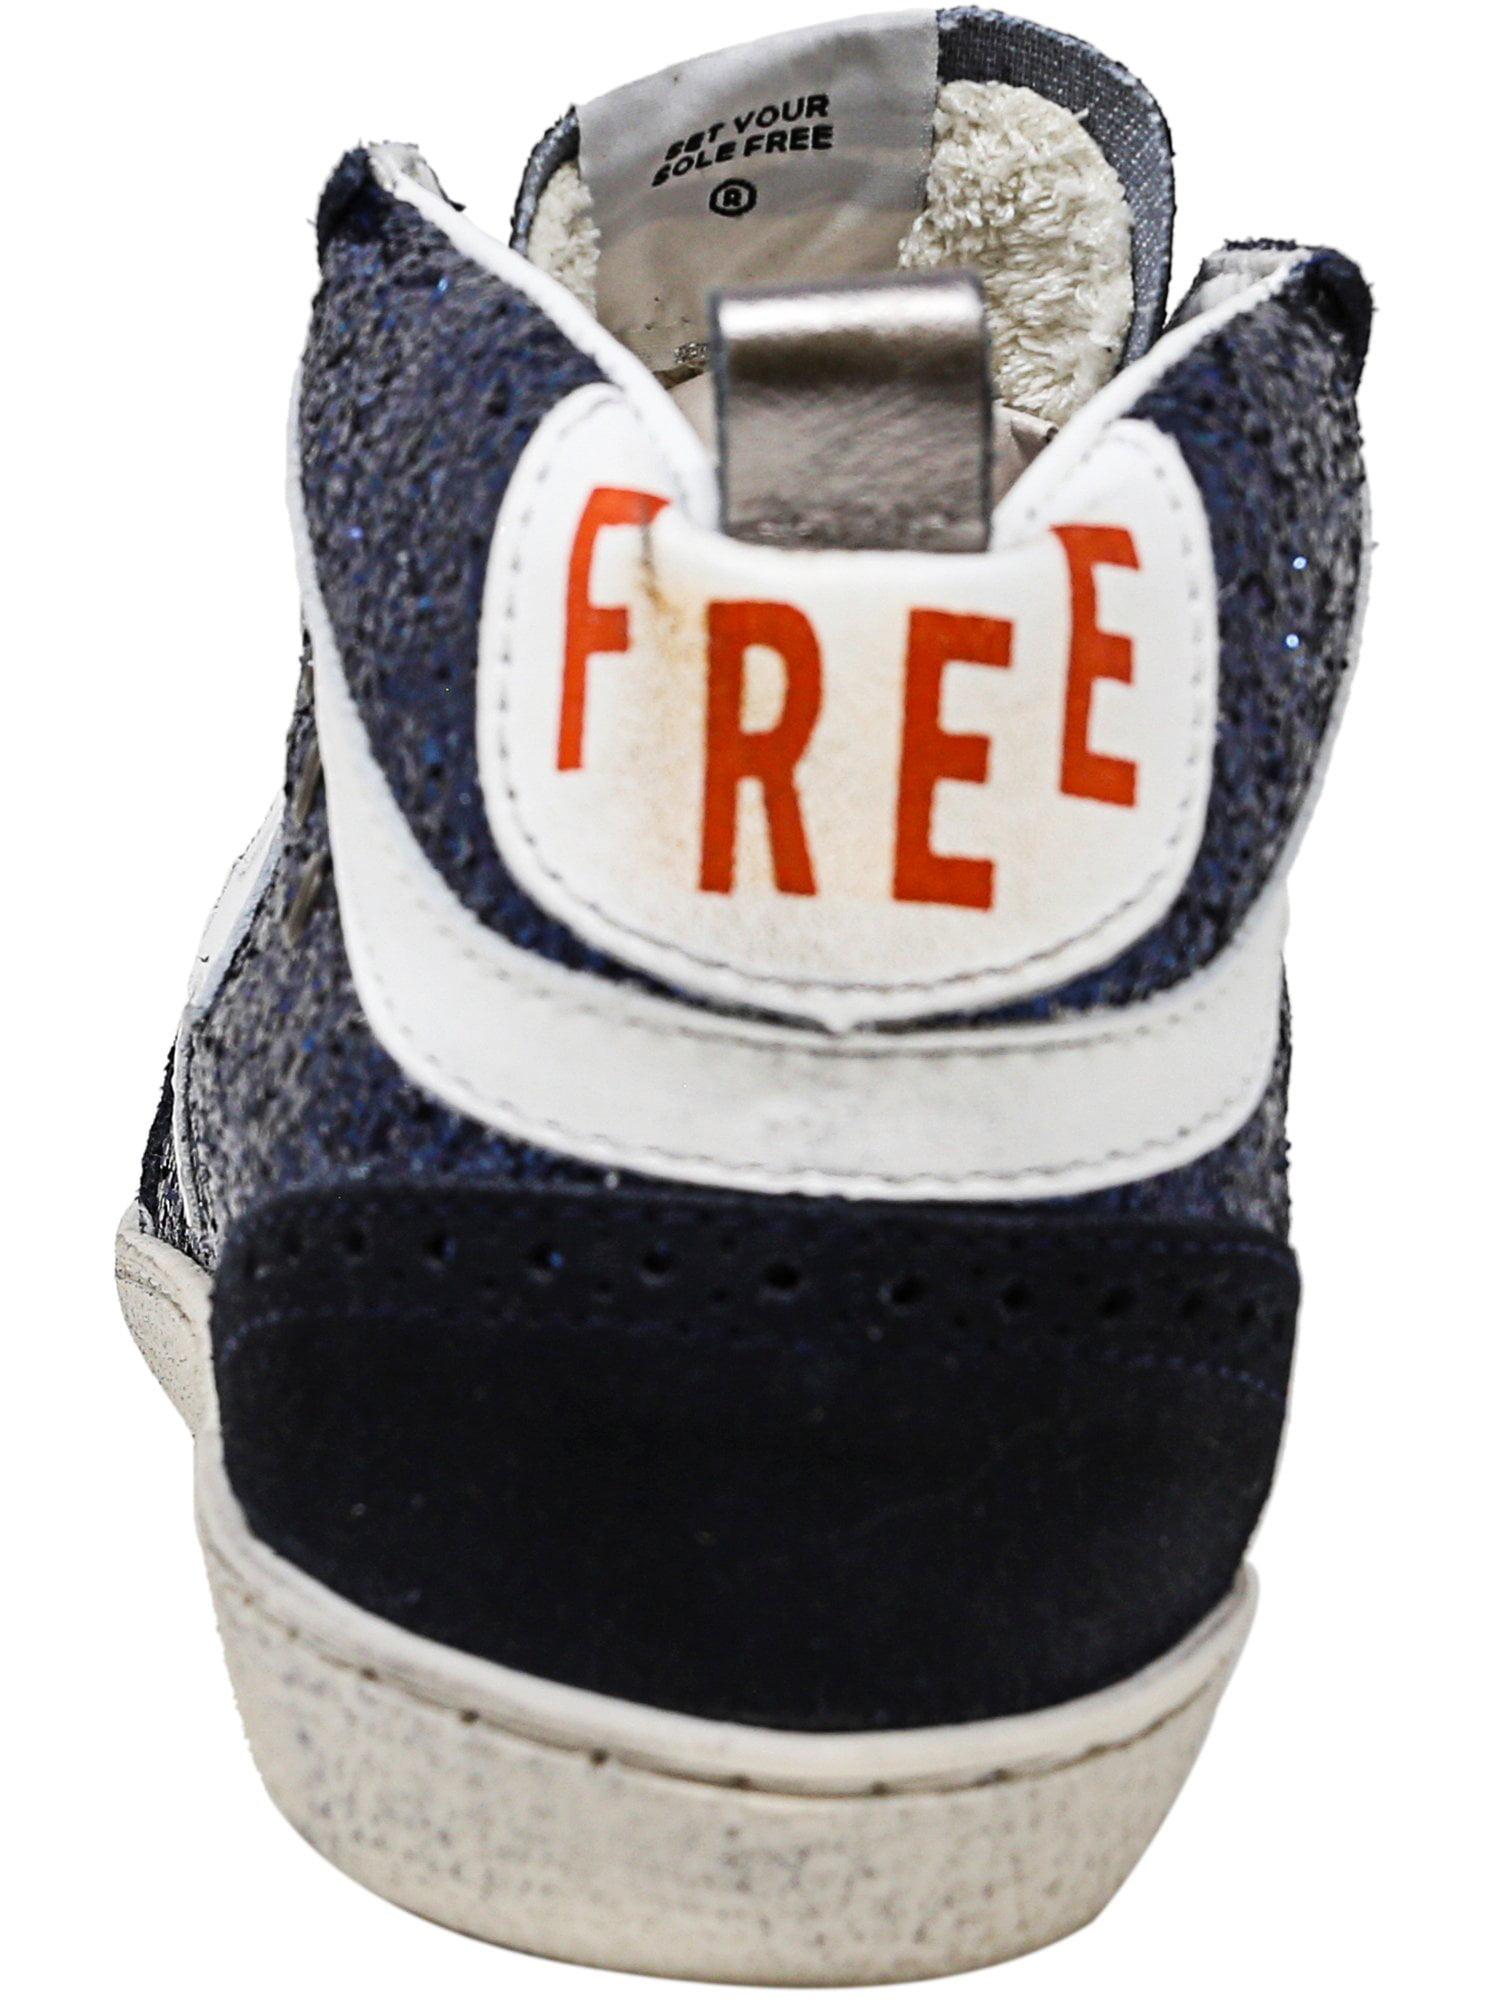 Freebird By Steven Women's Fb-516 Navy - Mid-Top Leather Fashion Sneaker - Navy 8M 72c406